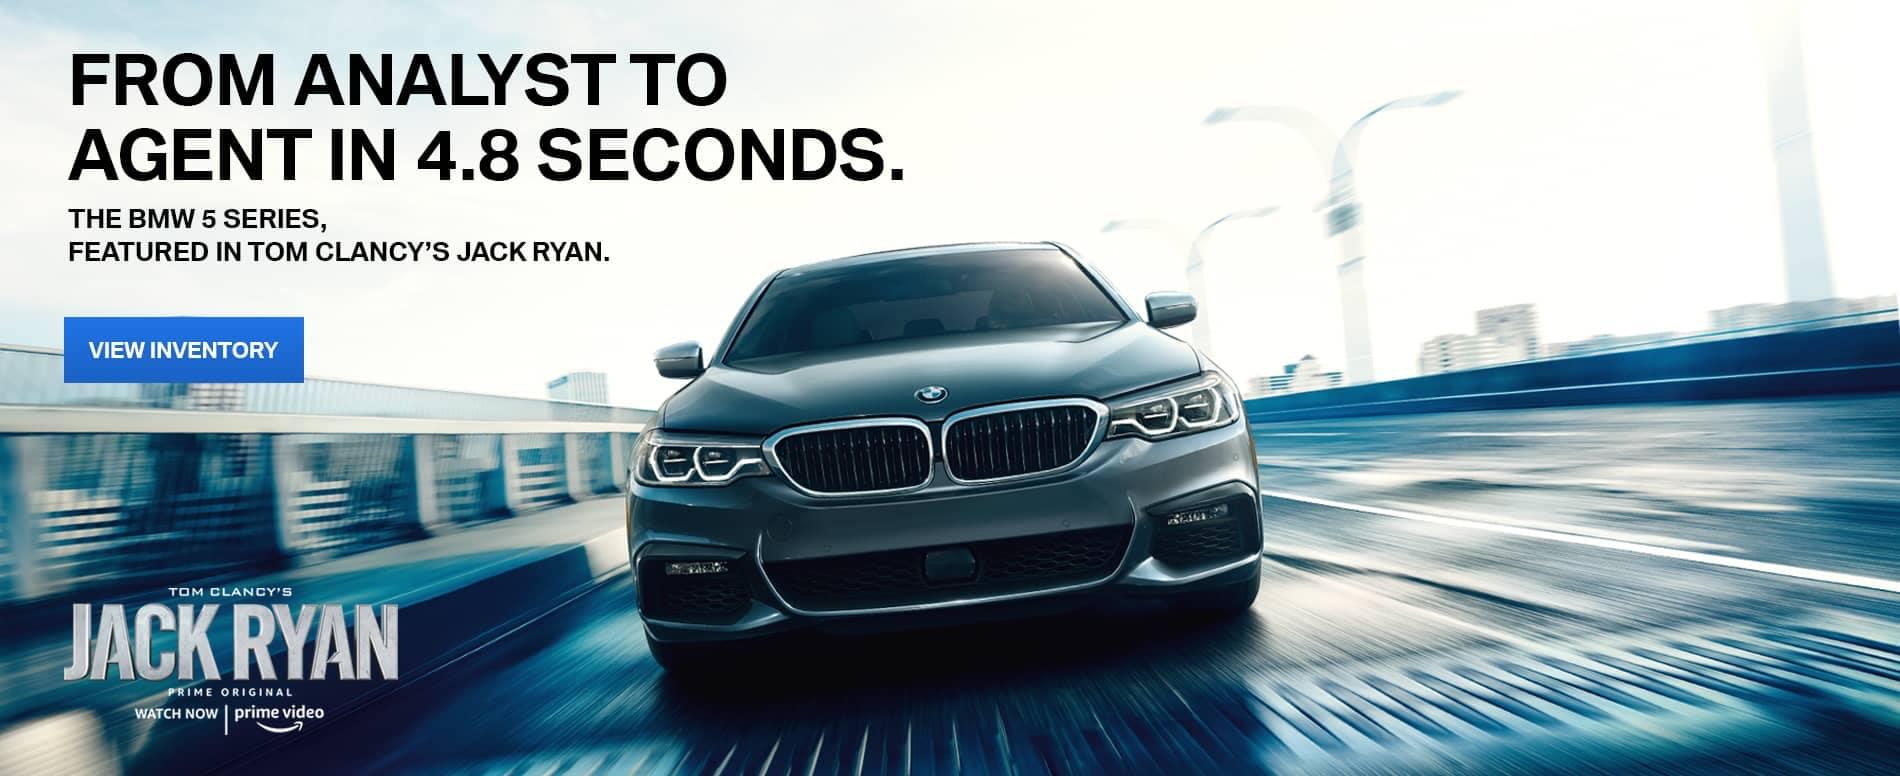 Jack Ryan BMW 5 Series